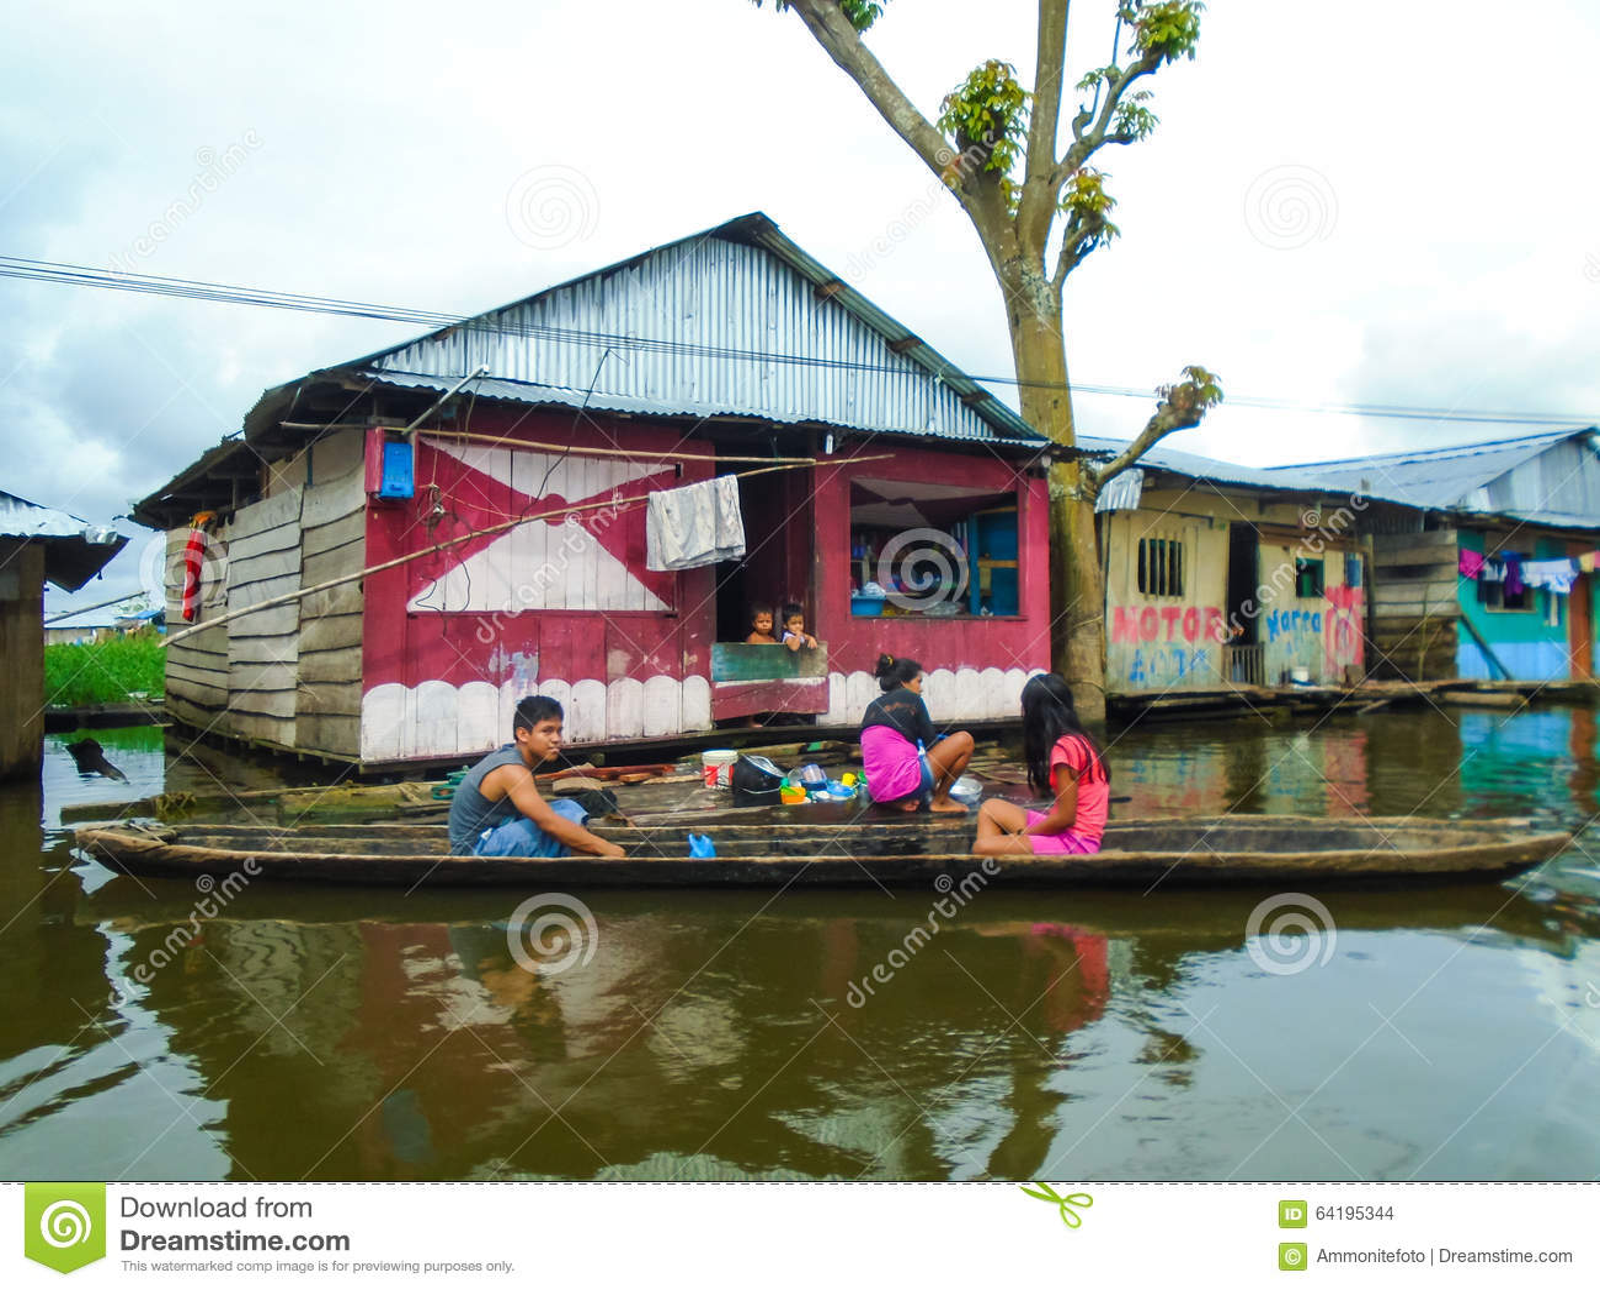 Floating village of Belen in Peru